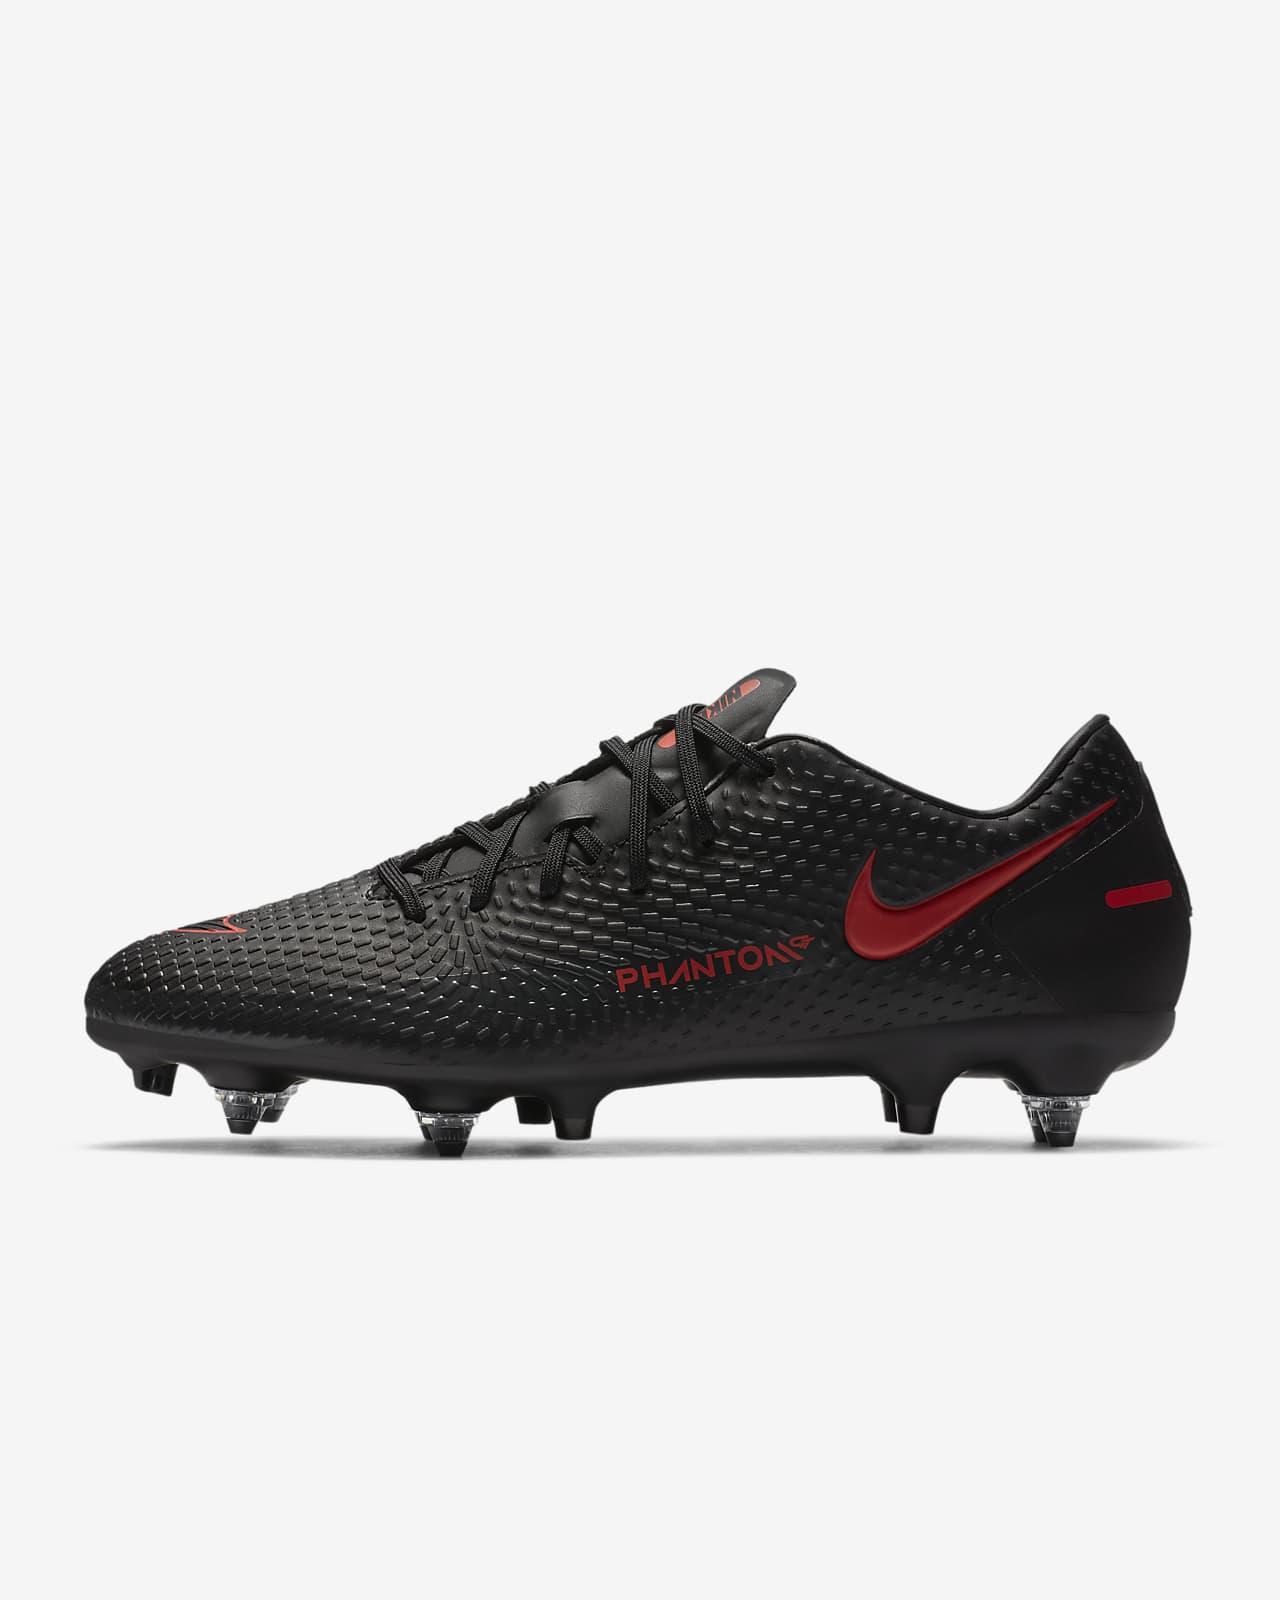 Chaussure de football à crampons pour terrain gras Nike Phantom GT Academy SG-Pro AC